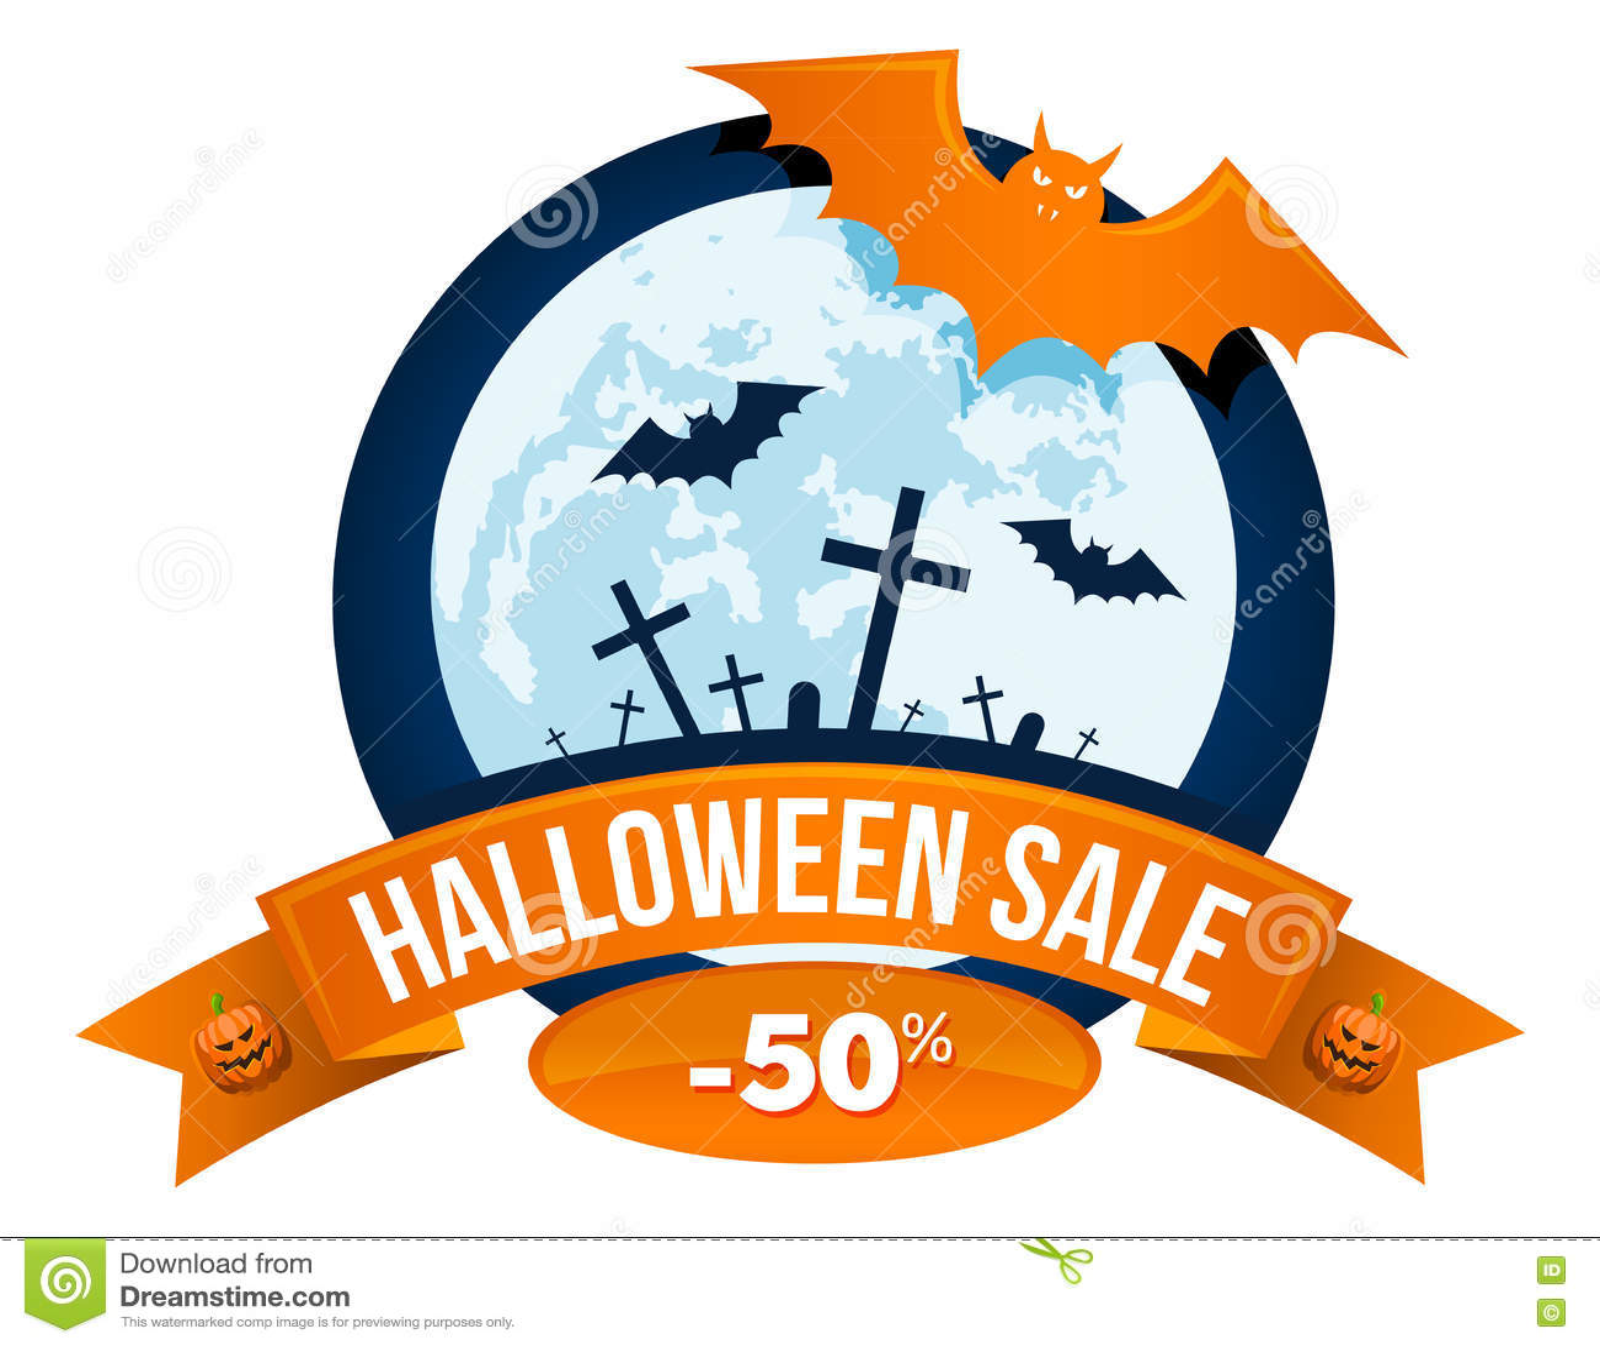 Logo ou label de vente de Halloween